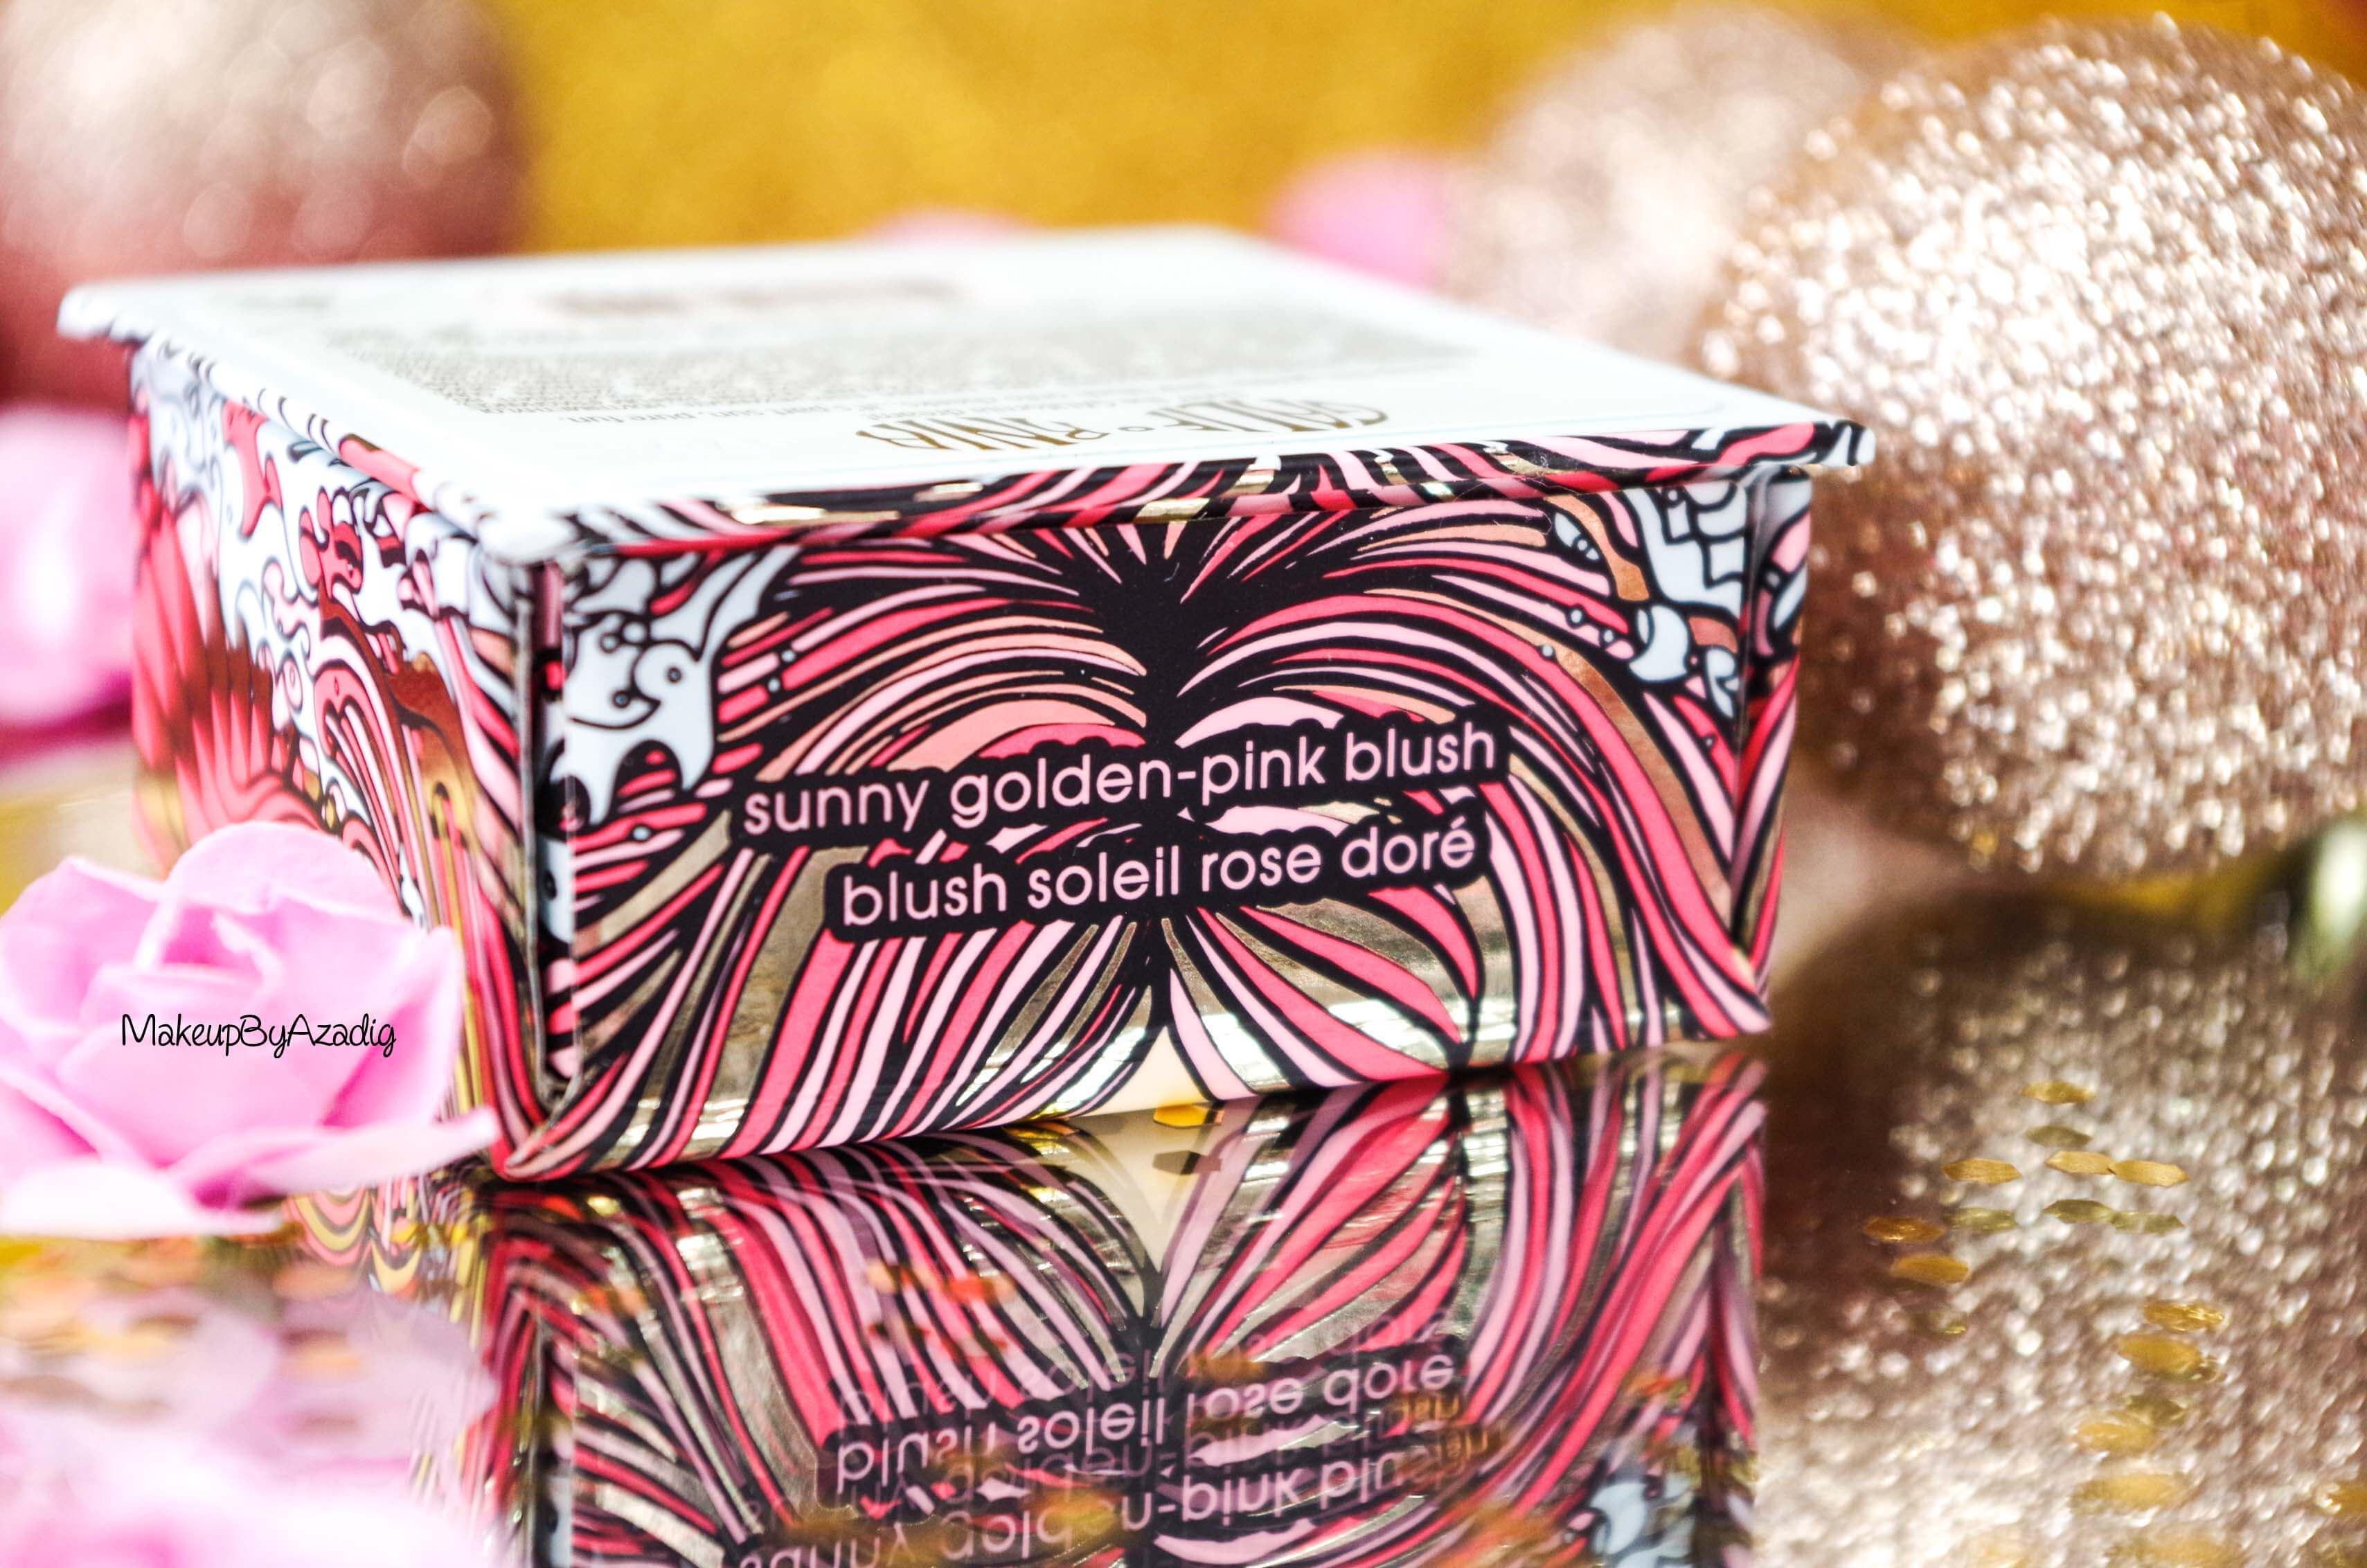 color-revue-review-blush-benefit-galifornia-san-francisco-sunny-golden-pink-blush-avis-prix-sephora-makeupbyazadig-coachella